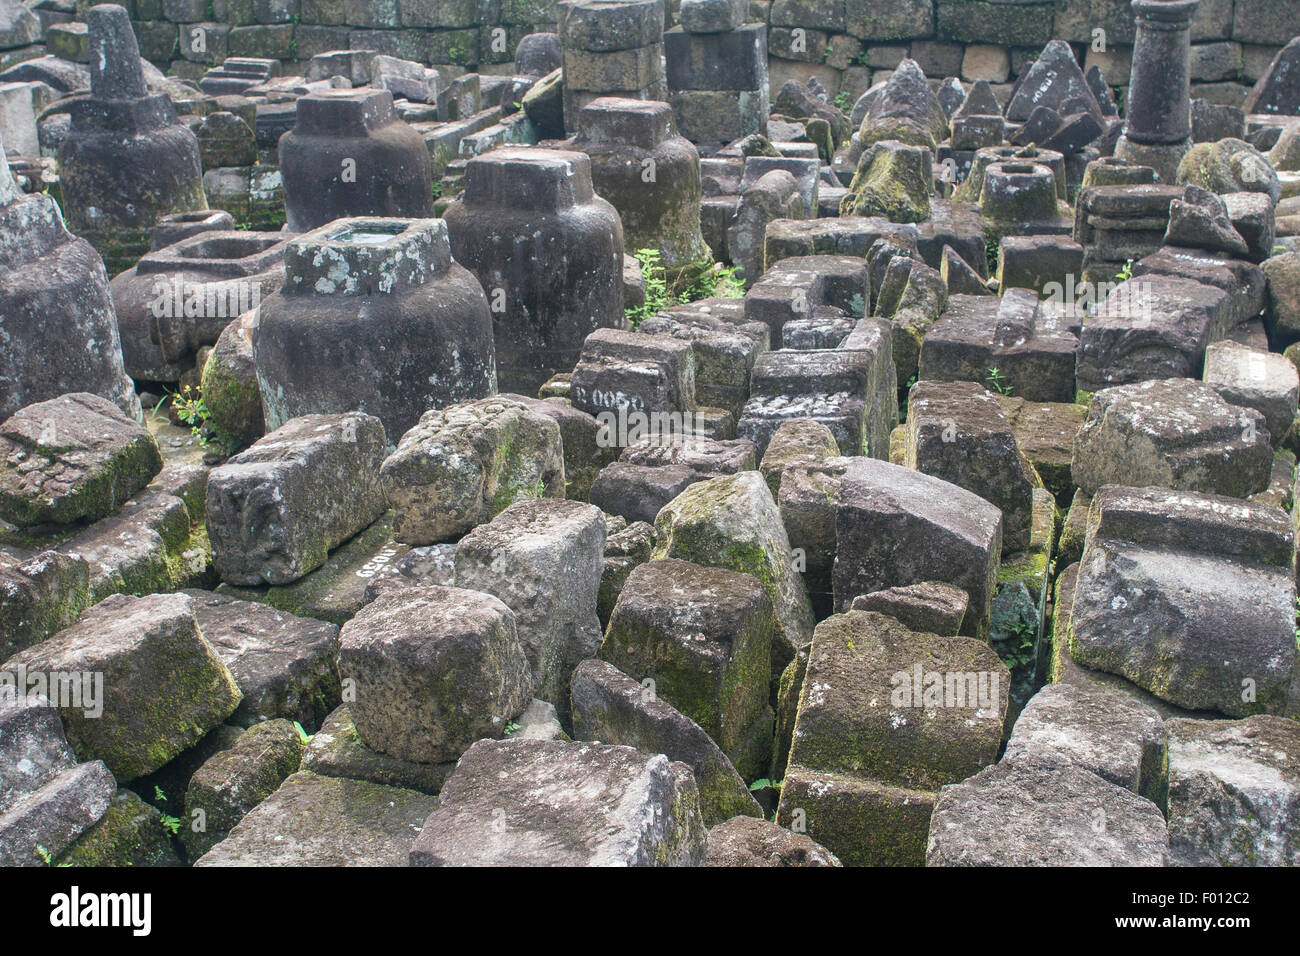 Jumble of stone blocks at the 9th-century Buddhist temple, Candi Mendut, of Java, Indonesia. - Stock Image